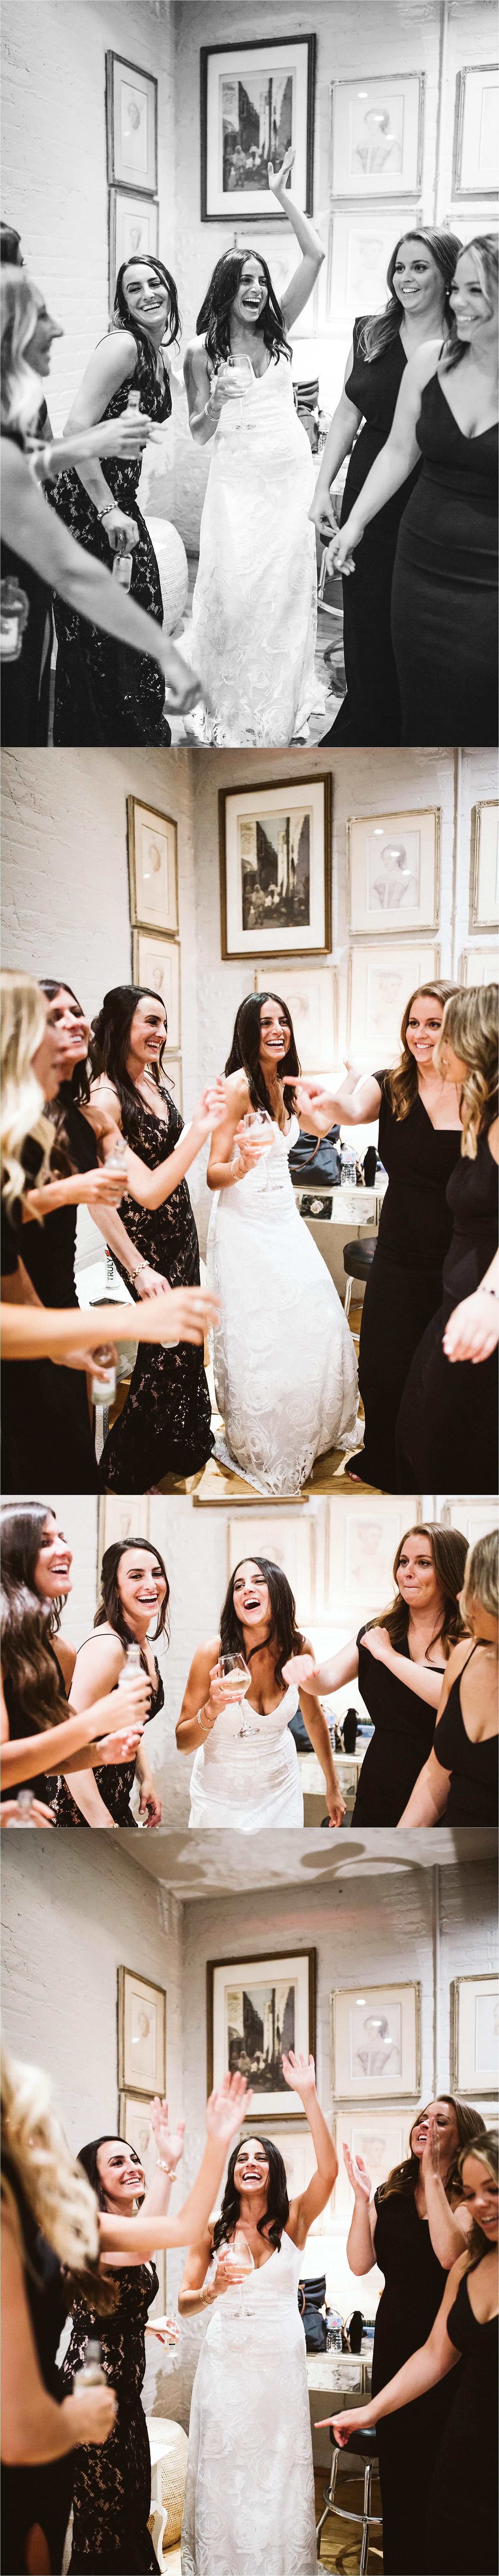 Bridgeport Art Center Wedding_0062.jpg